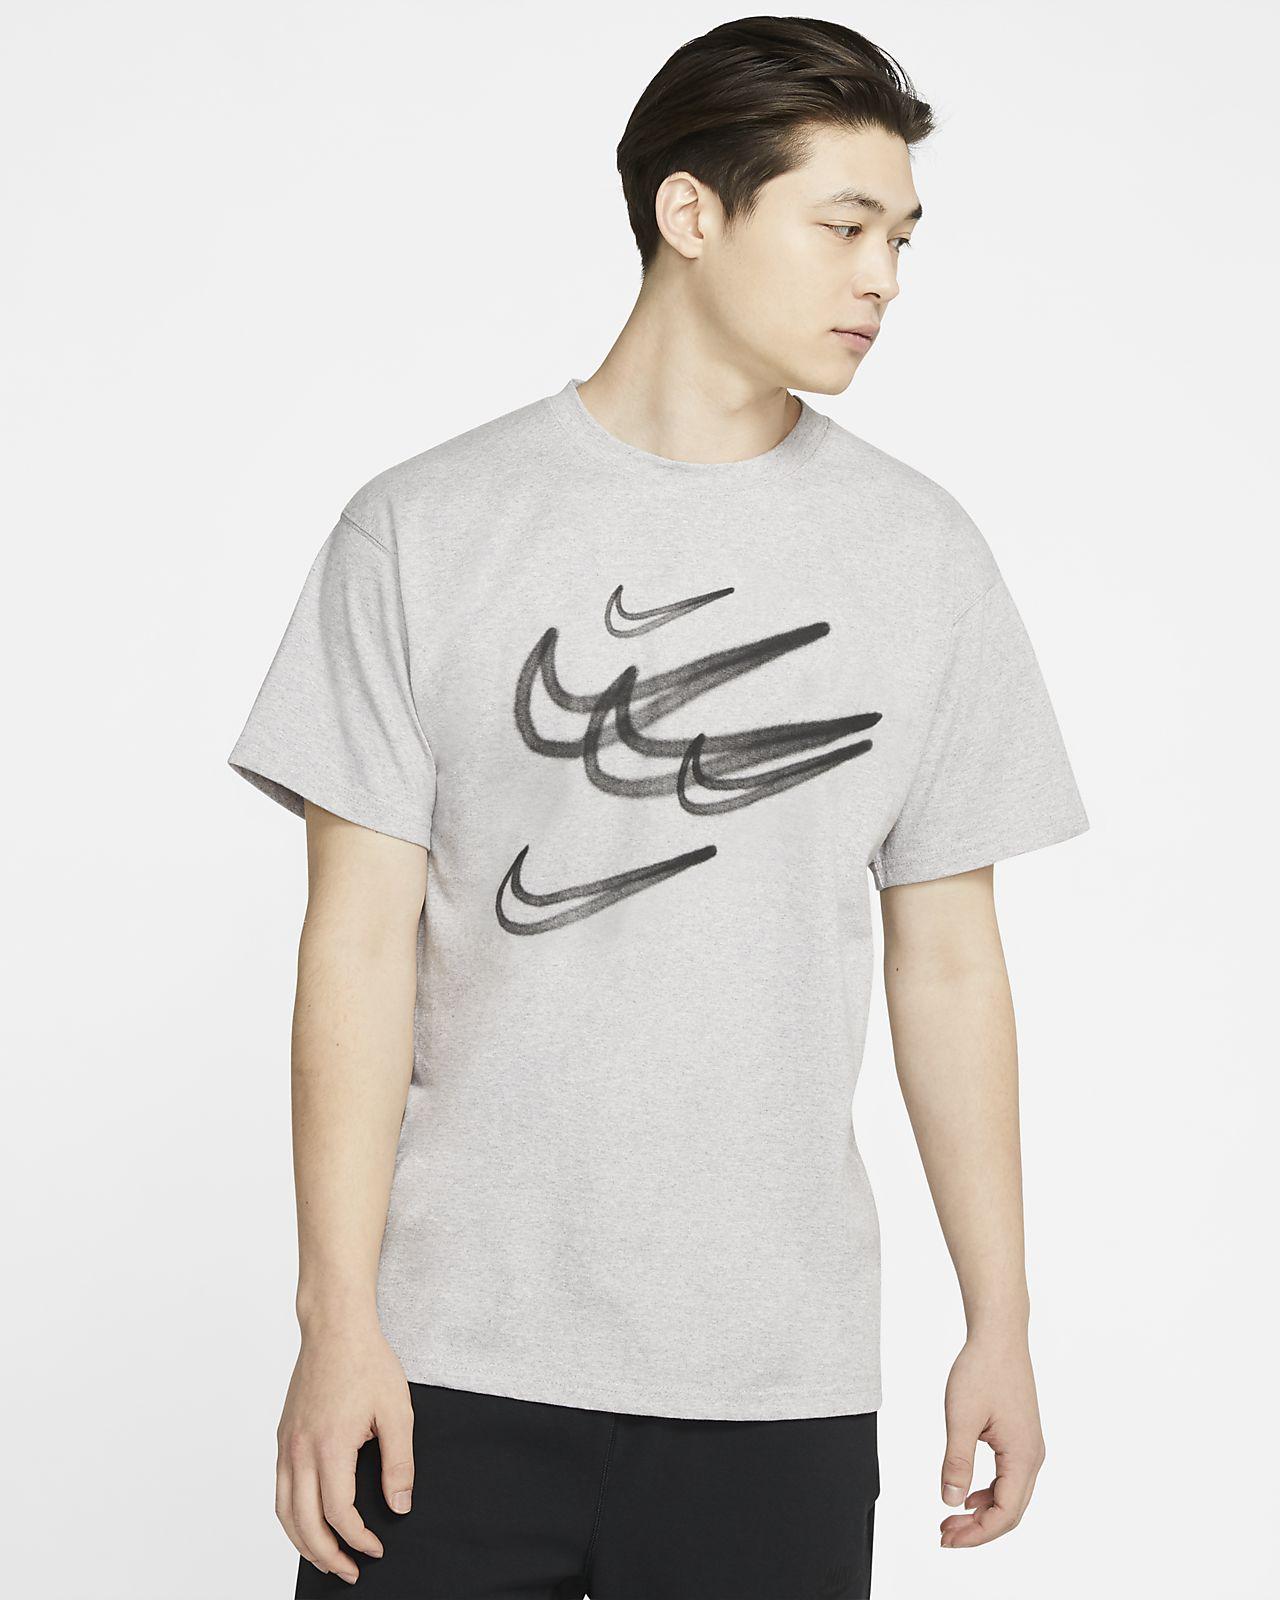 Nike Sportswear Max 90 男子T恤